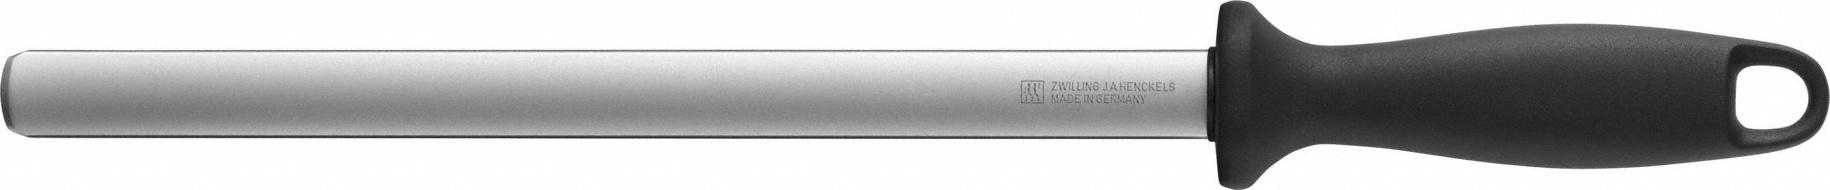 Zwilling J.A. Henckels Мусат с алмазным покрытием, 260 мм по цене 7 570